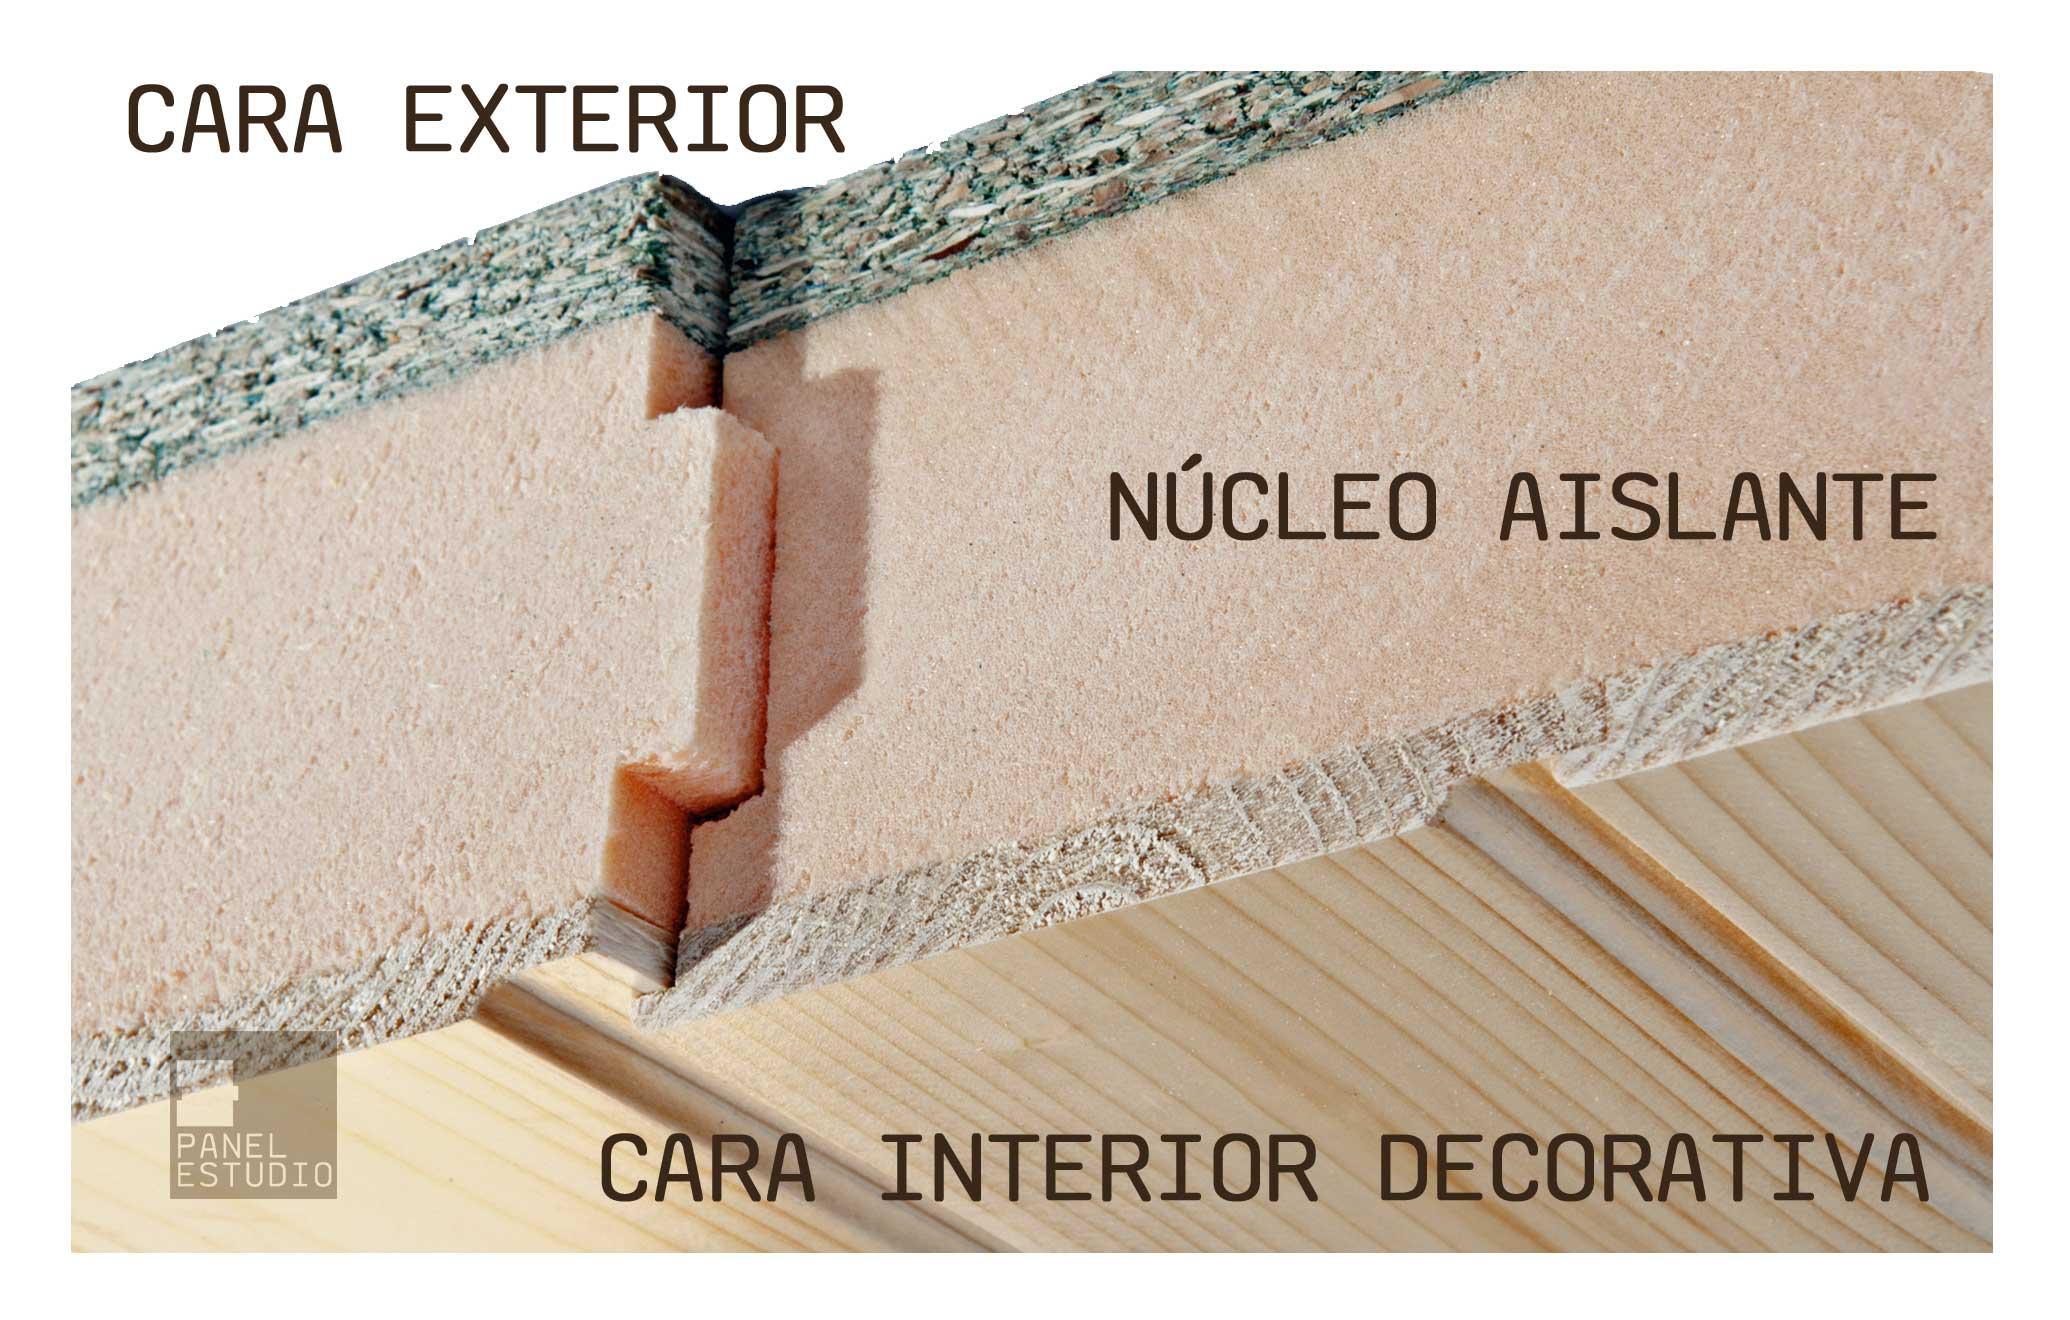 panelestudio panel de madera aislante para cubiertas